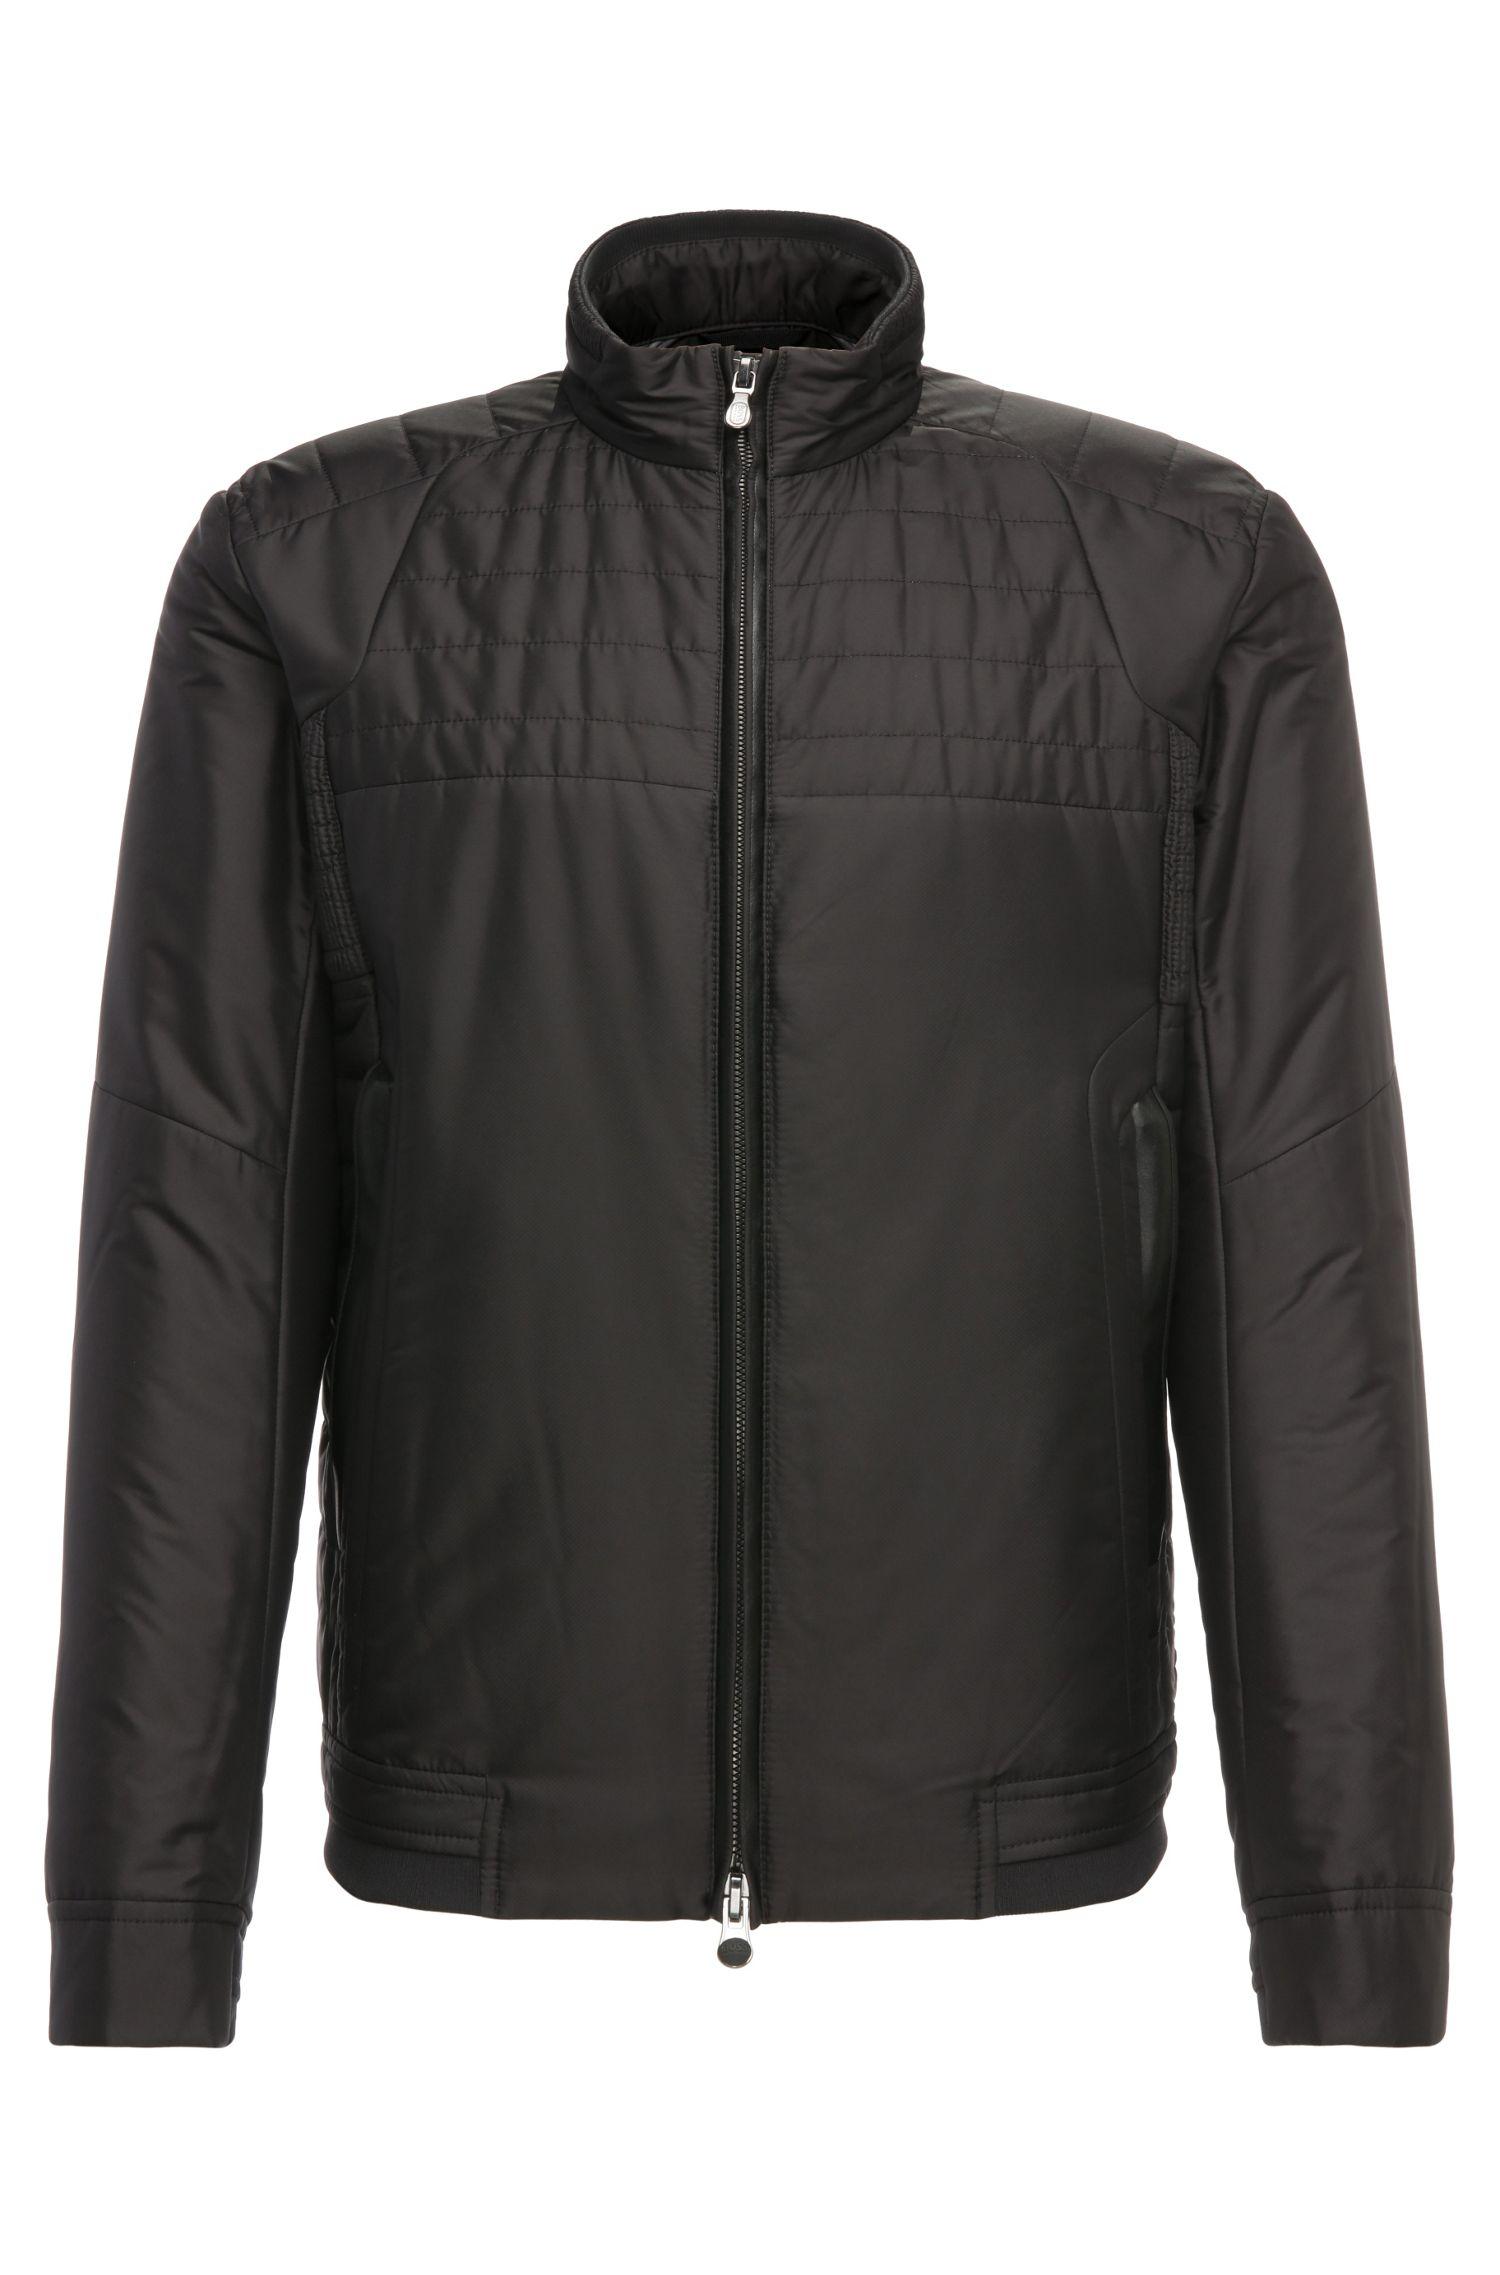 'Jomark' | Moto Detail Thermal Jacket